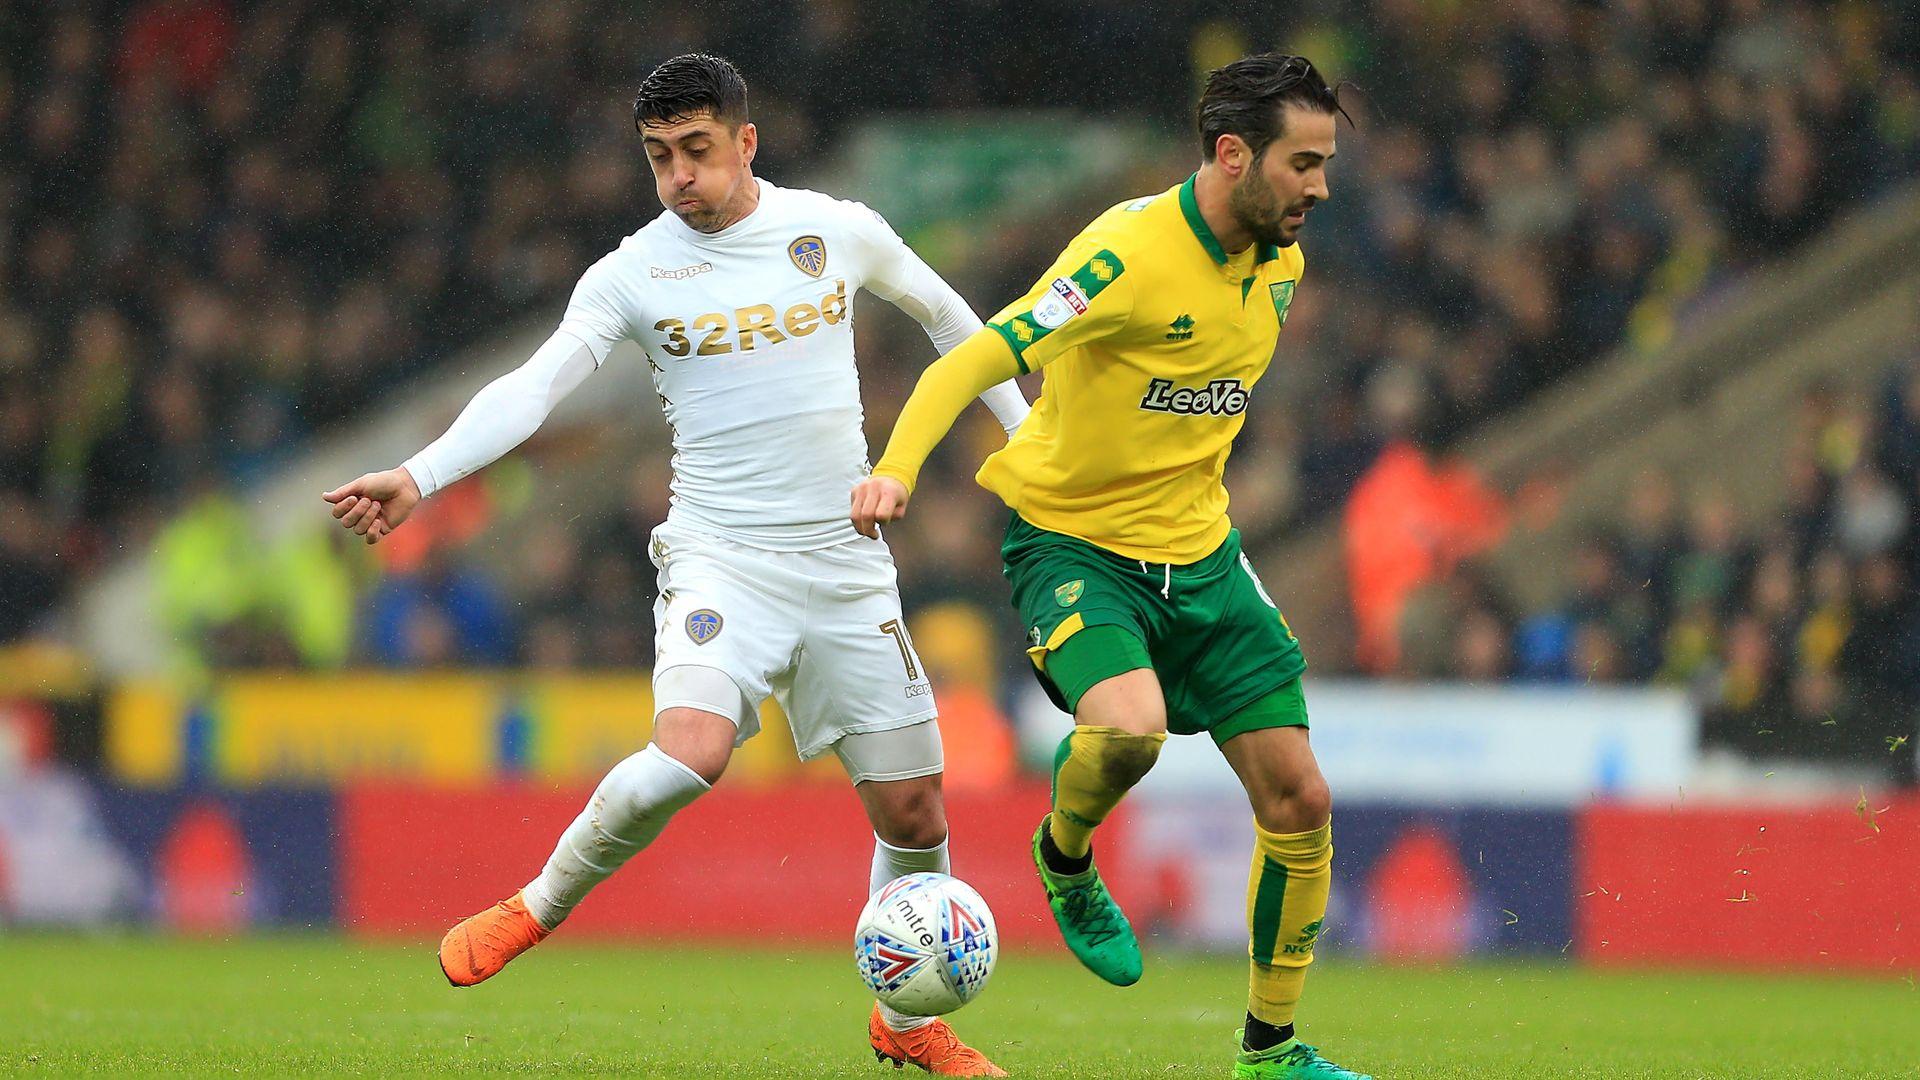 Mario Vrancic, Pablo Hernandez - Norwich vs Leeds Utd